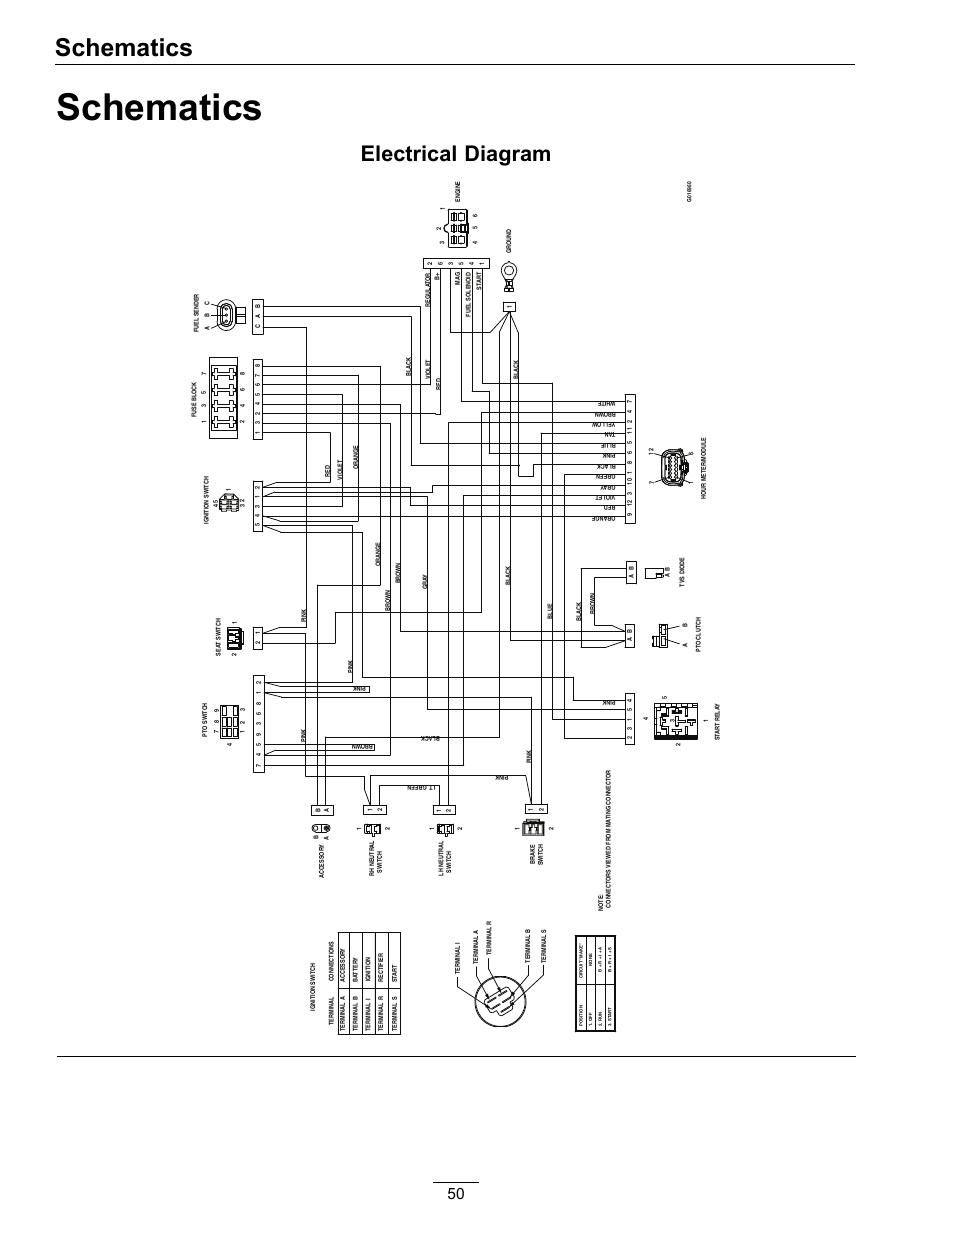 DIAGRAM] 1985 Holiday Rambler Wiring Diagrams FULL Version HD Quality Wiring  Diagrams - STRUCTUREDSETTLEME.NIBERMA.FRstructuredsettleme.niberma.fr